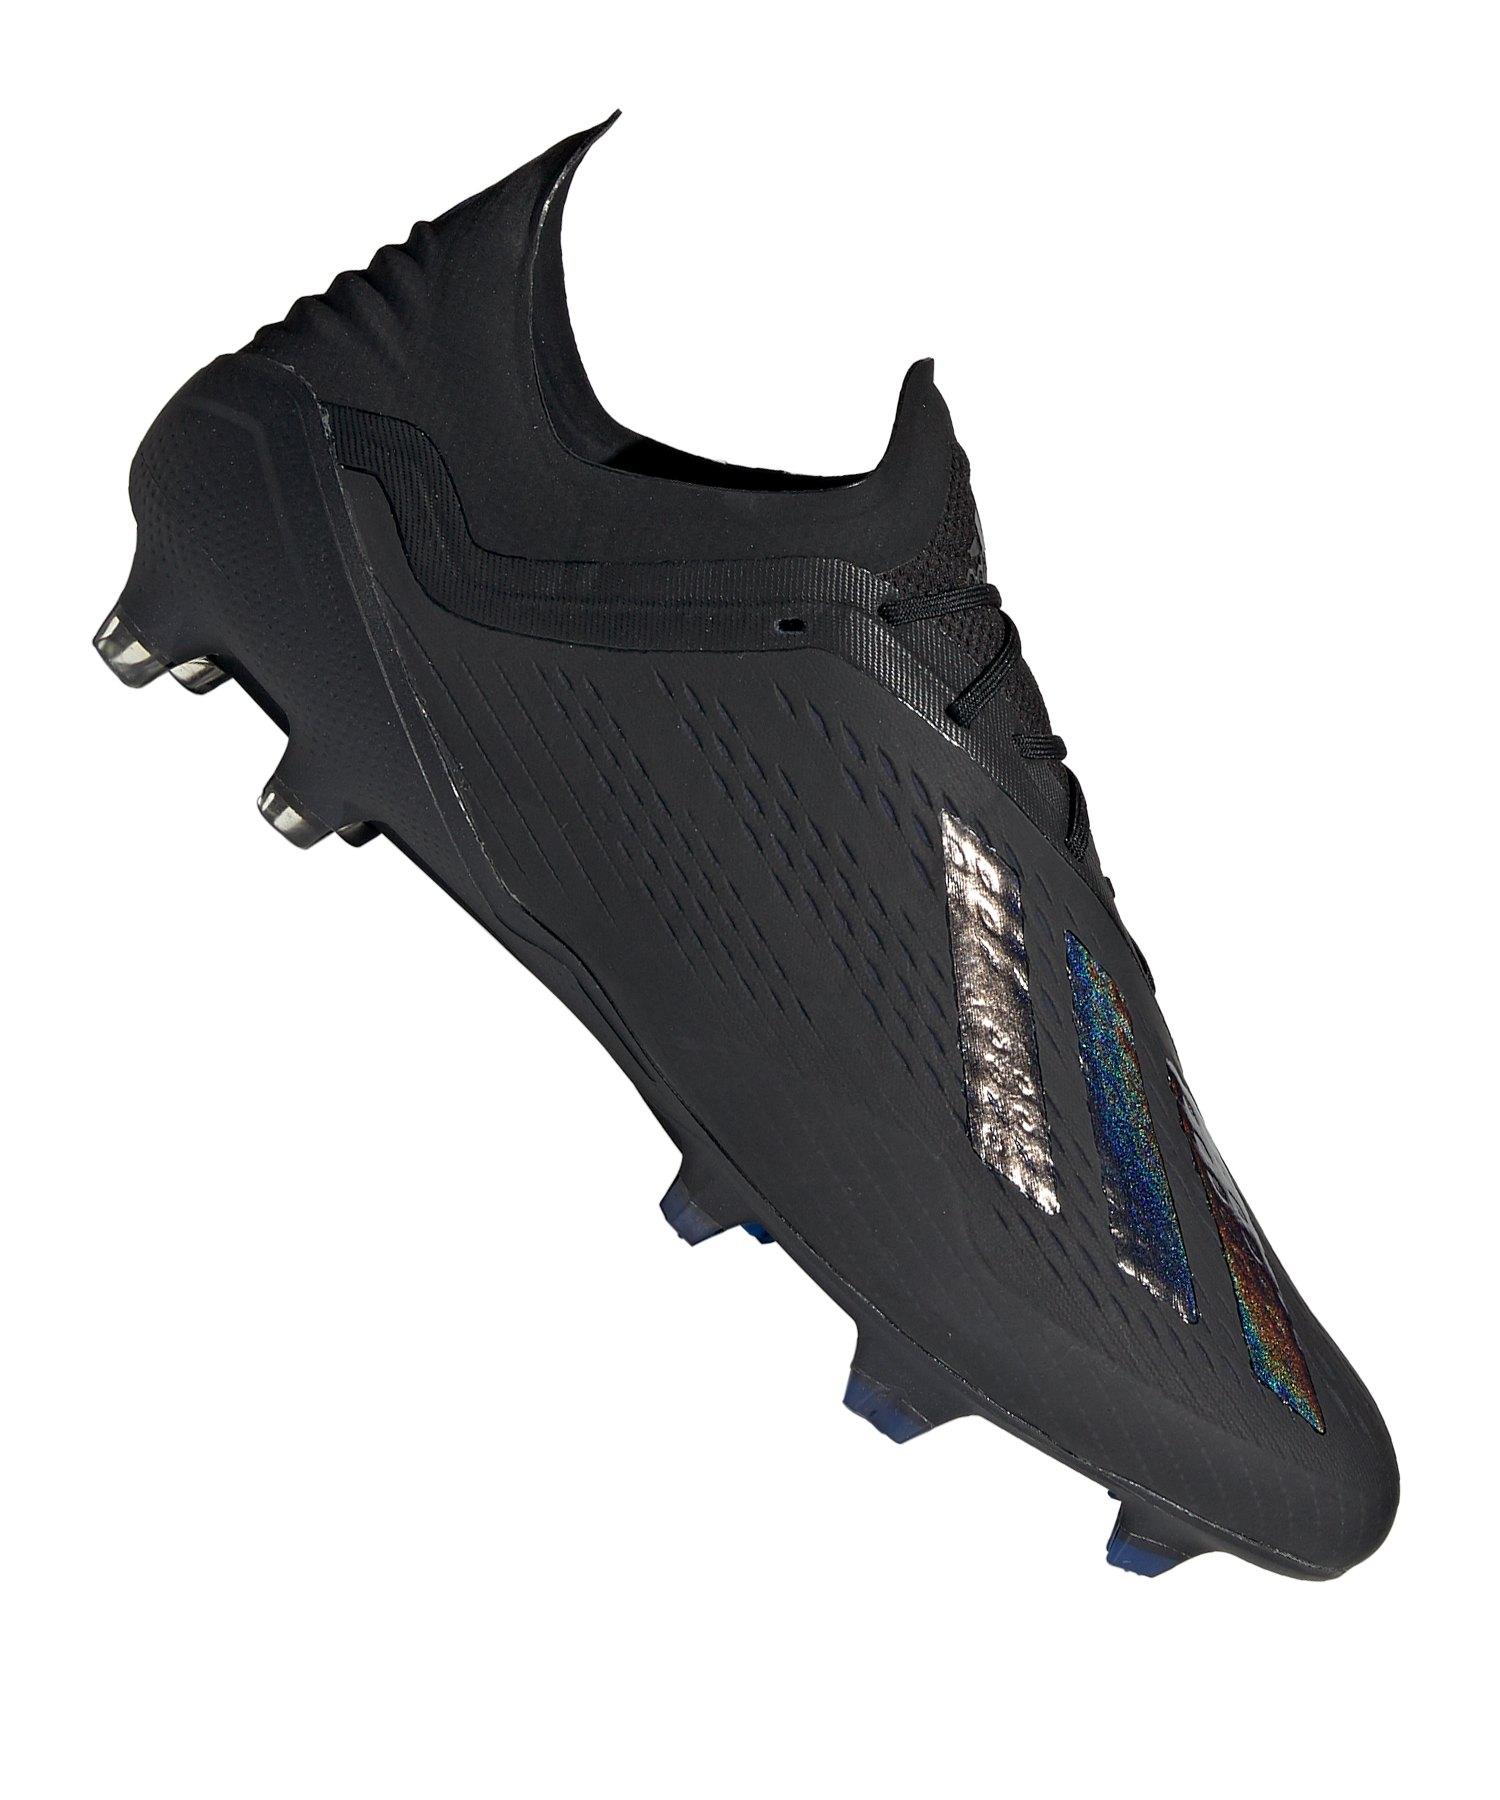 adidas X 18.1 FG Schwarz - schwarz